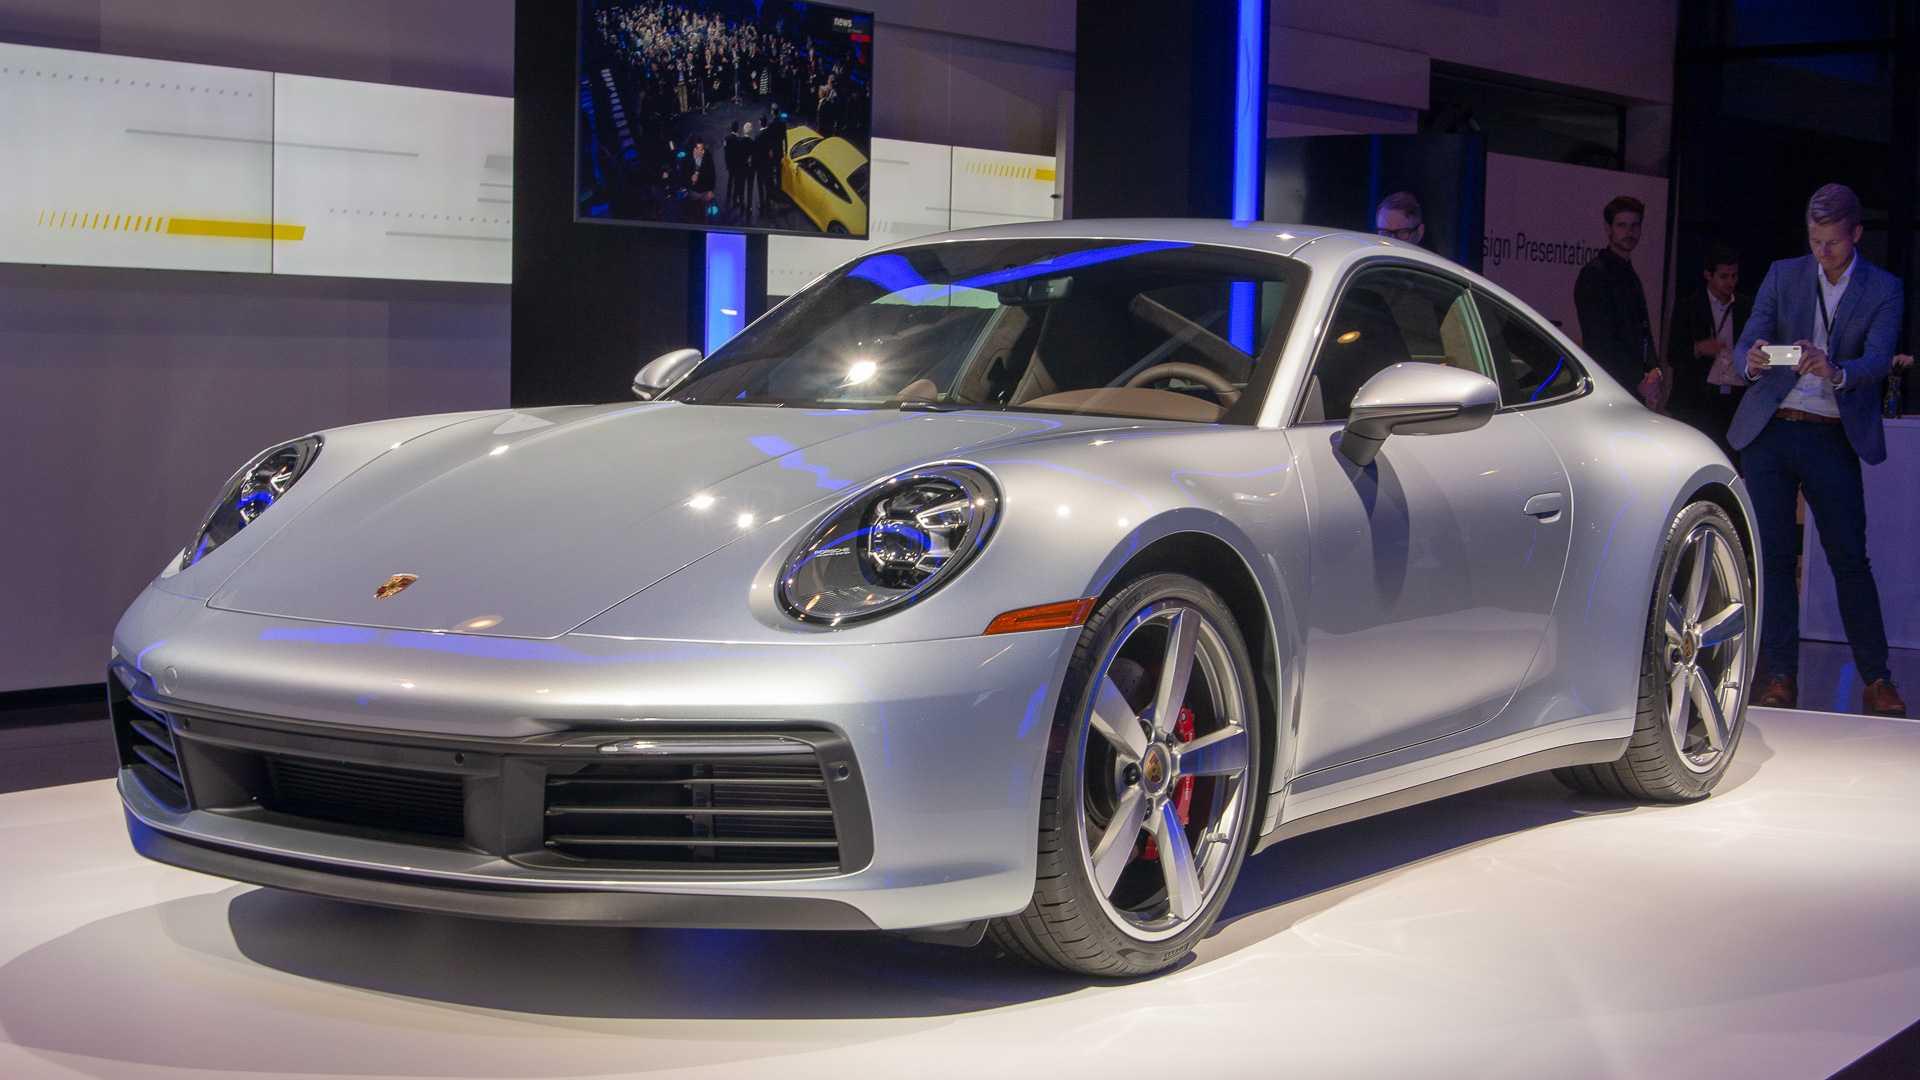 67 Best Review 2020 Porsche 992 History for 2020 Porsche 992